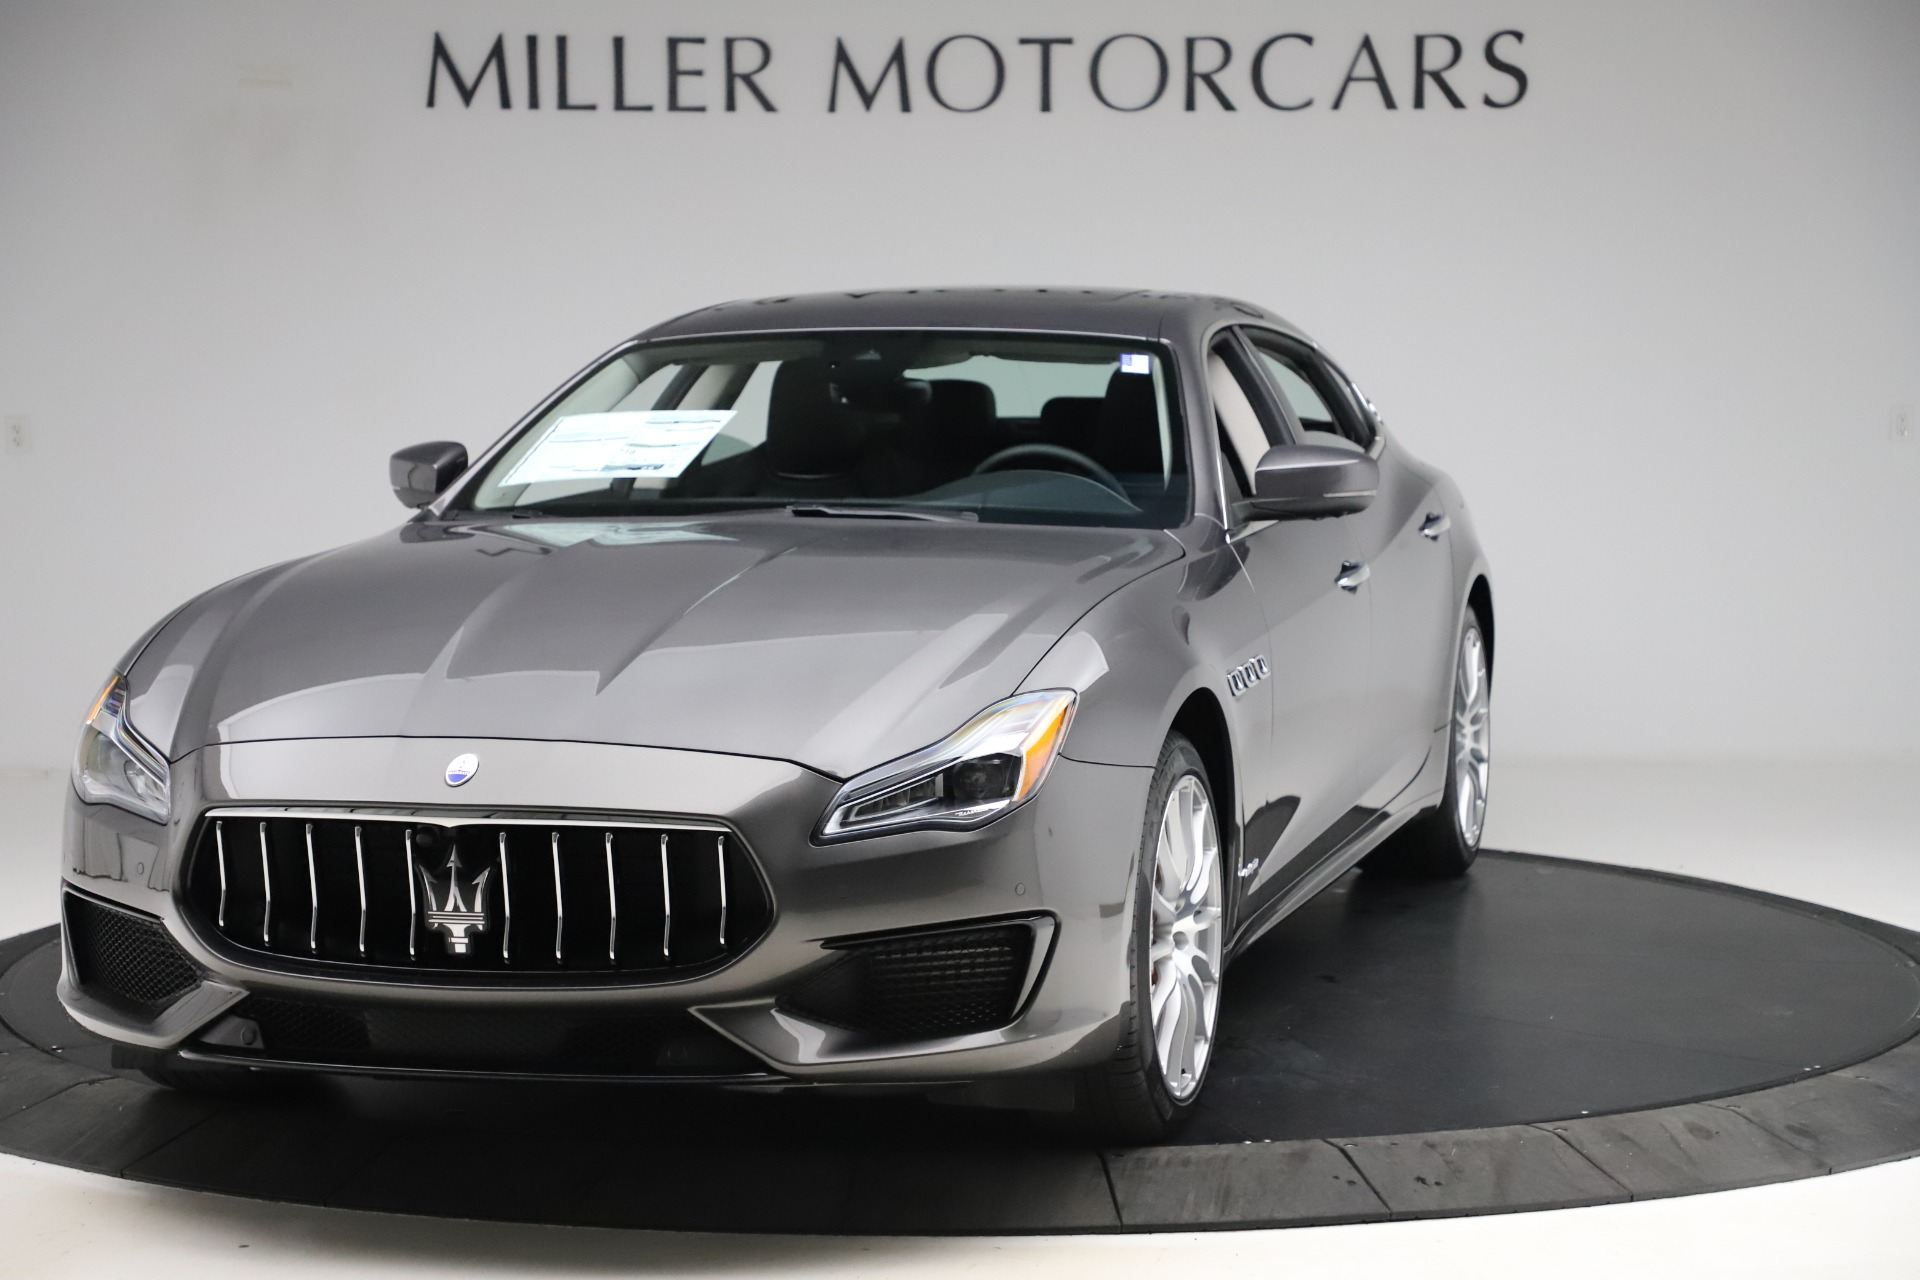 New 2020 Maserati Quattroporte S Q4 GranSport for sale $121,885 at McLaren Greenwich in Greenwich CT 06830 1